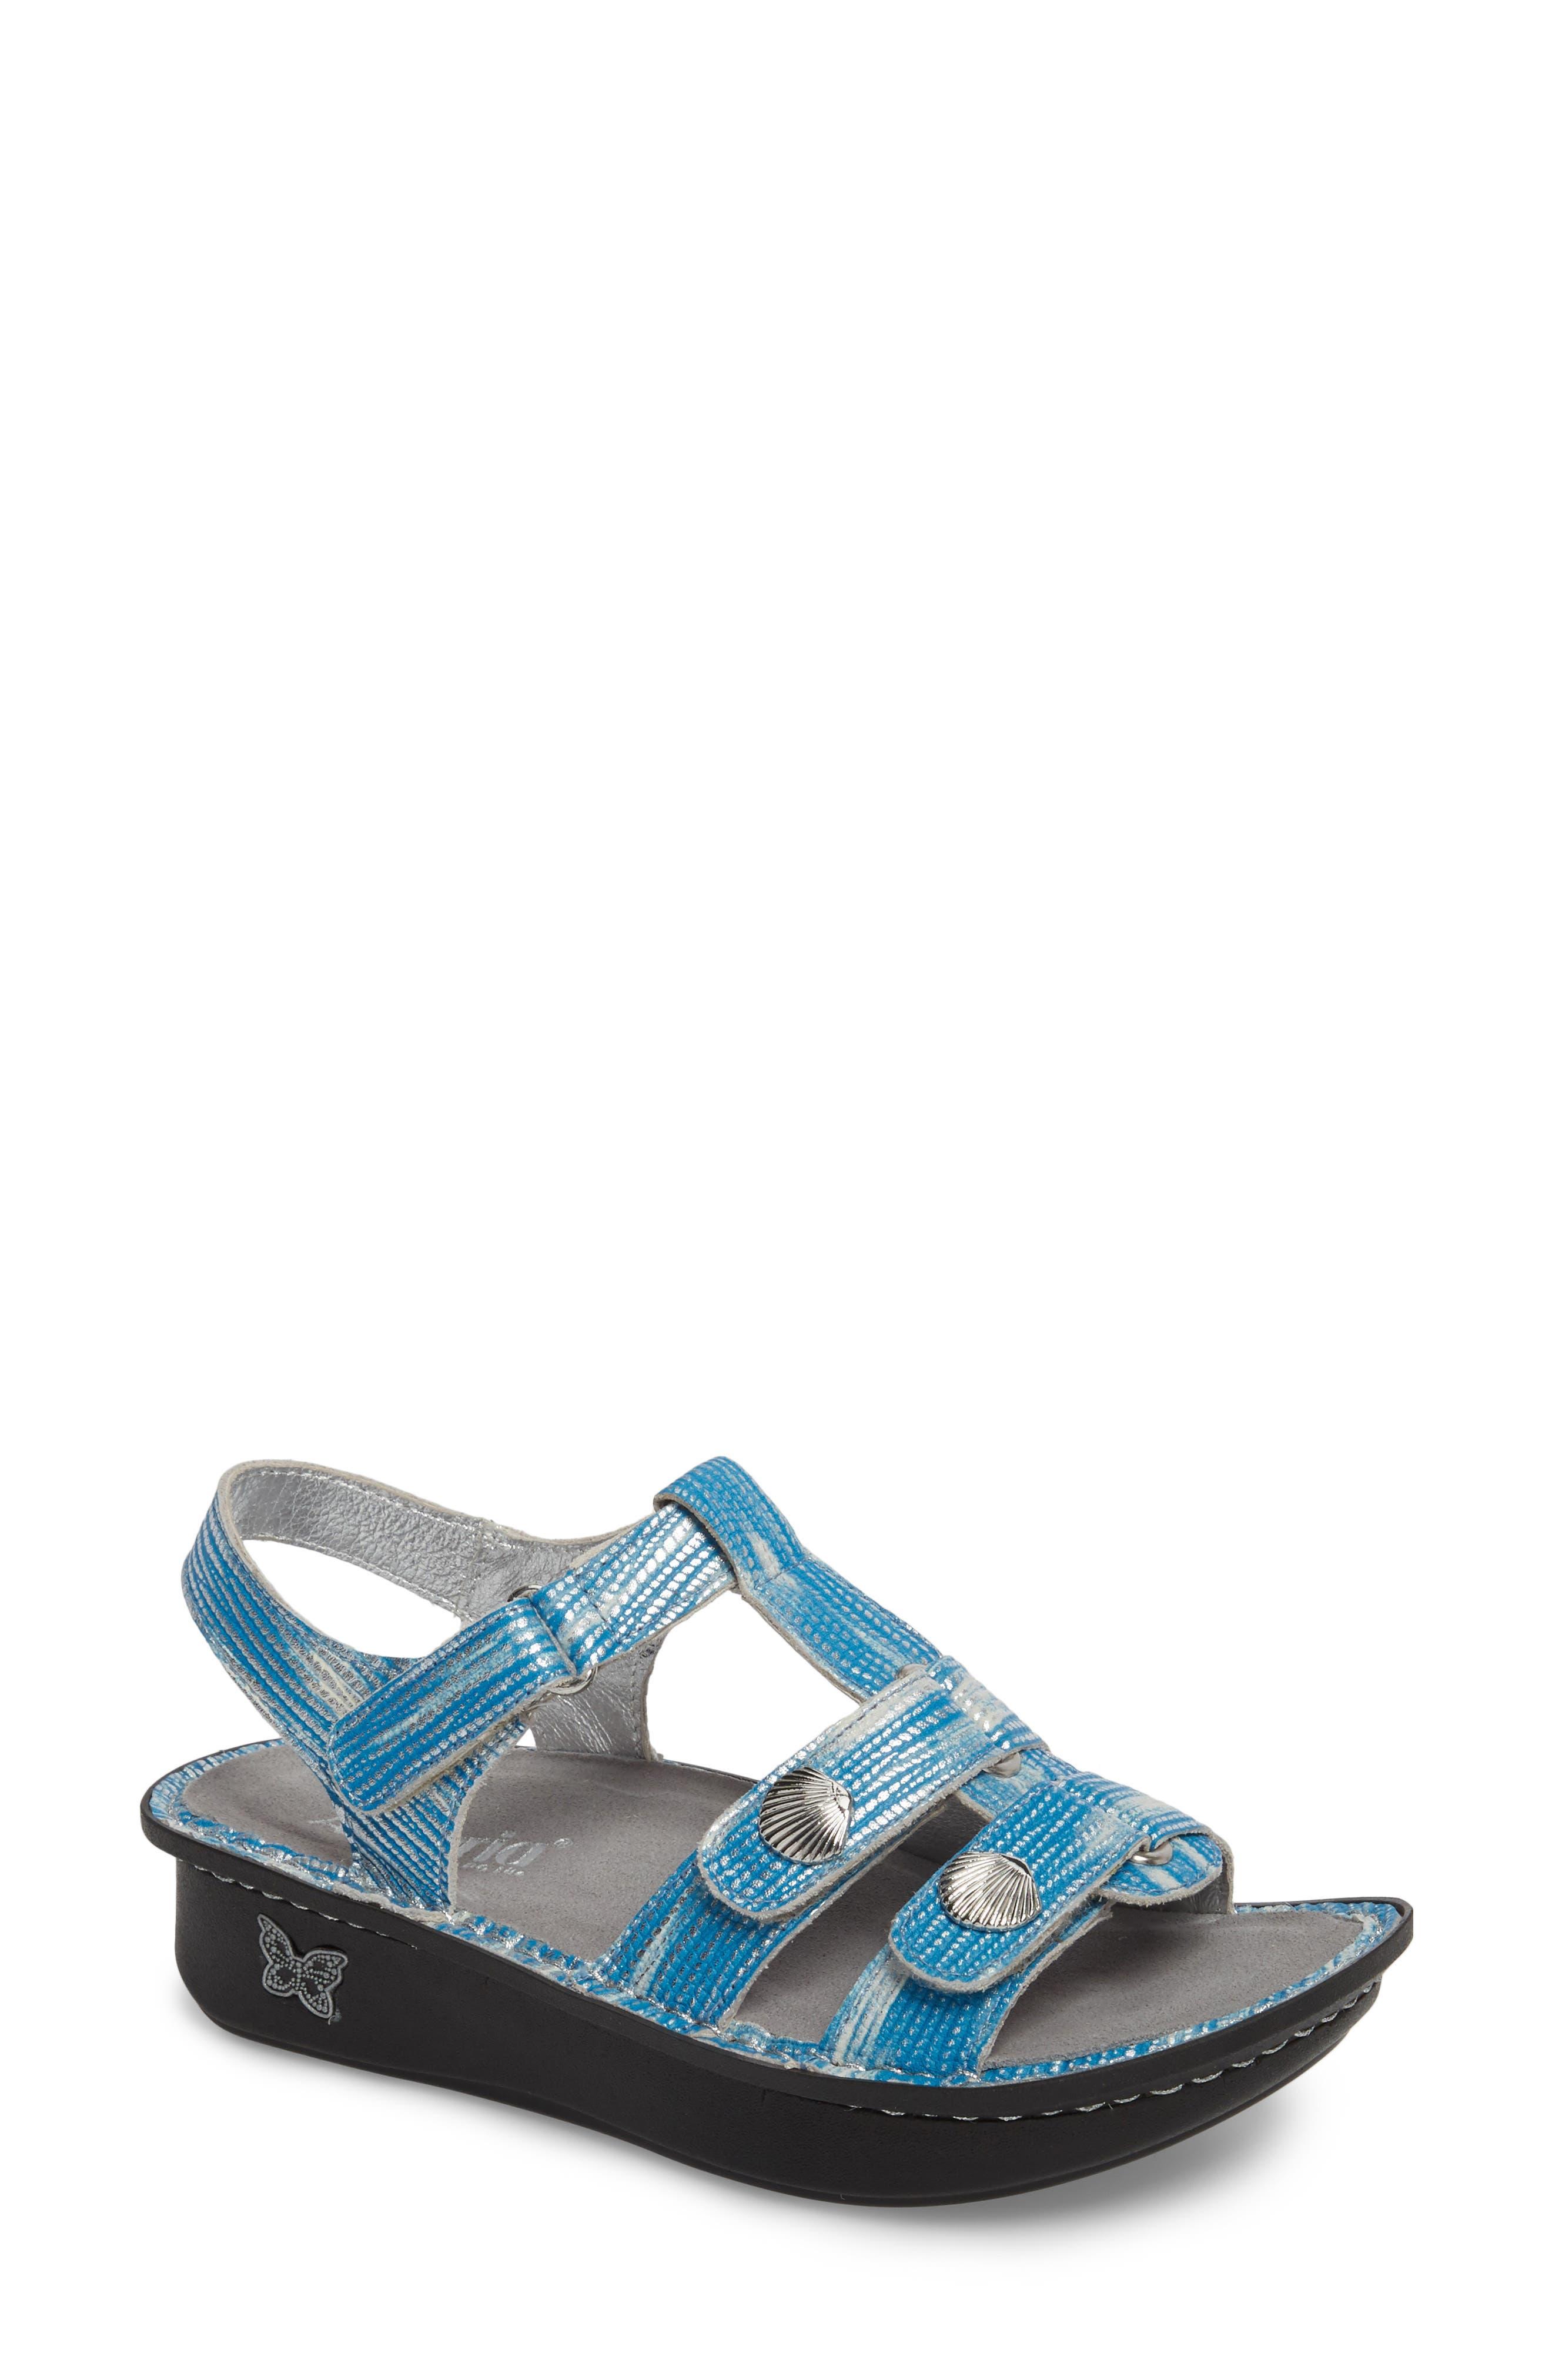 'Kleo' Sandal,                         Main,                         color, Wrapture Blues Leather